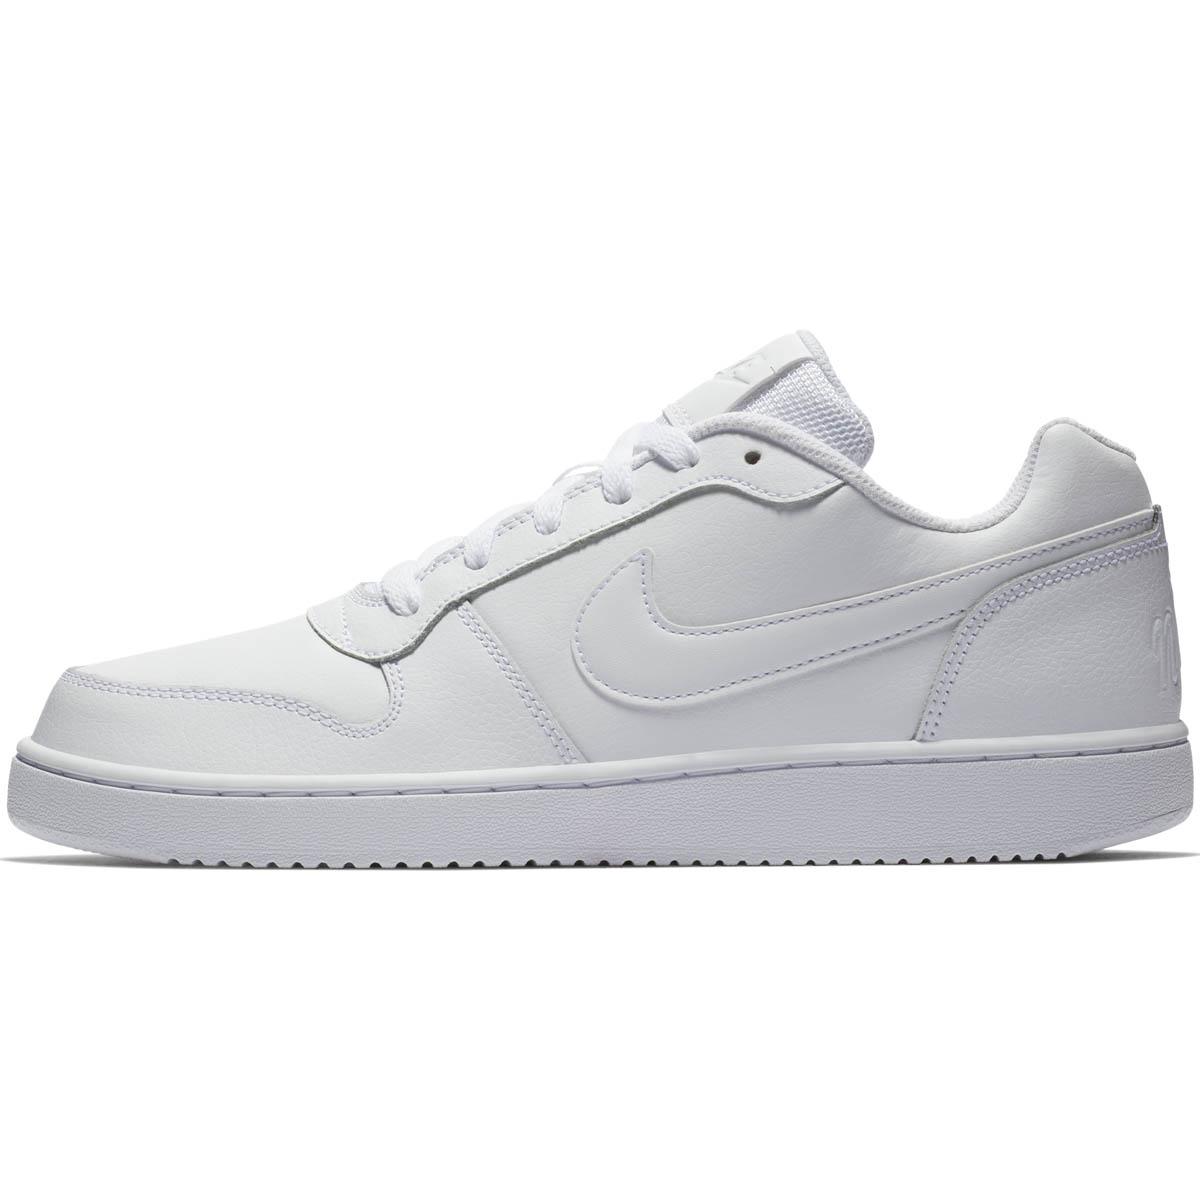 Nike NIKE EBERNON LOW BRANCO - AQ1775-100 - Blitstorm 3906db0bc1a57